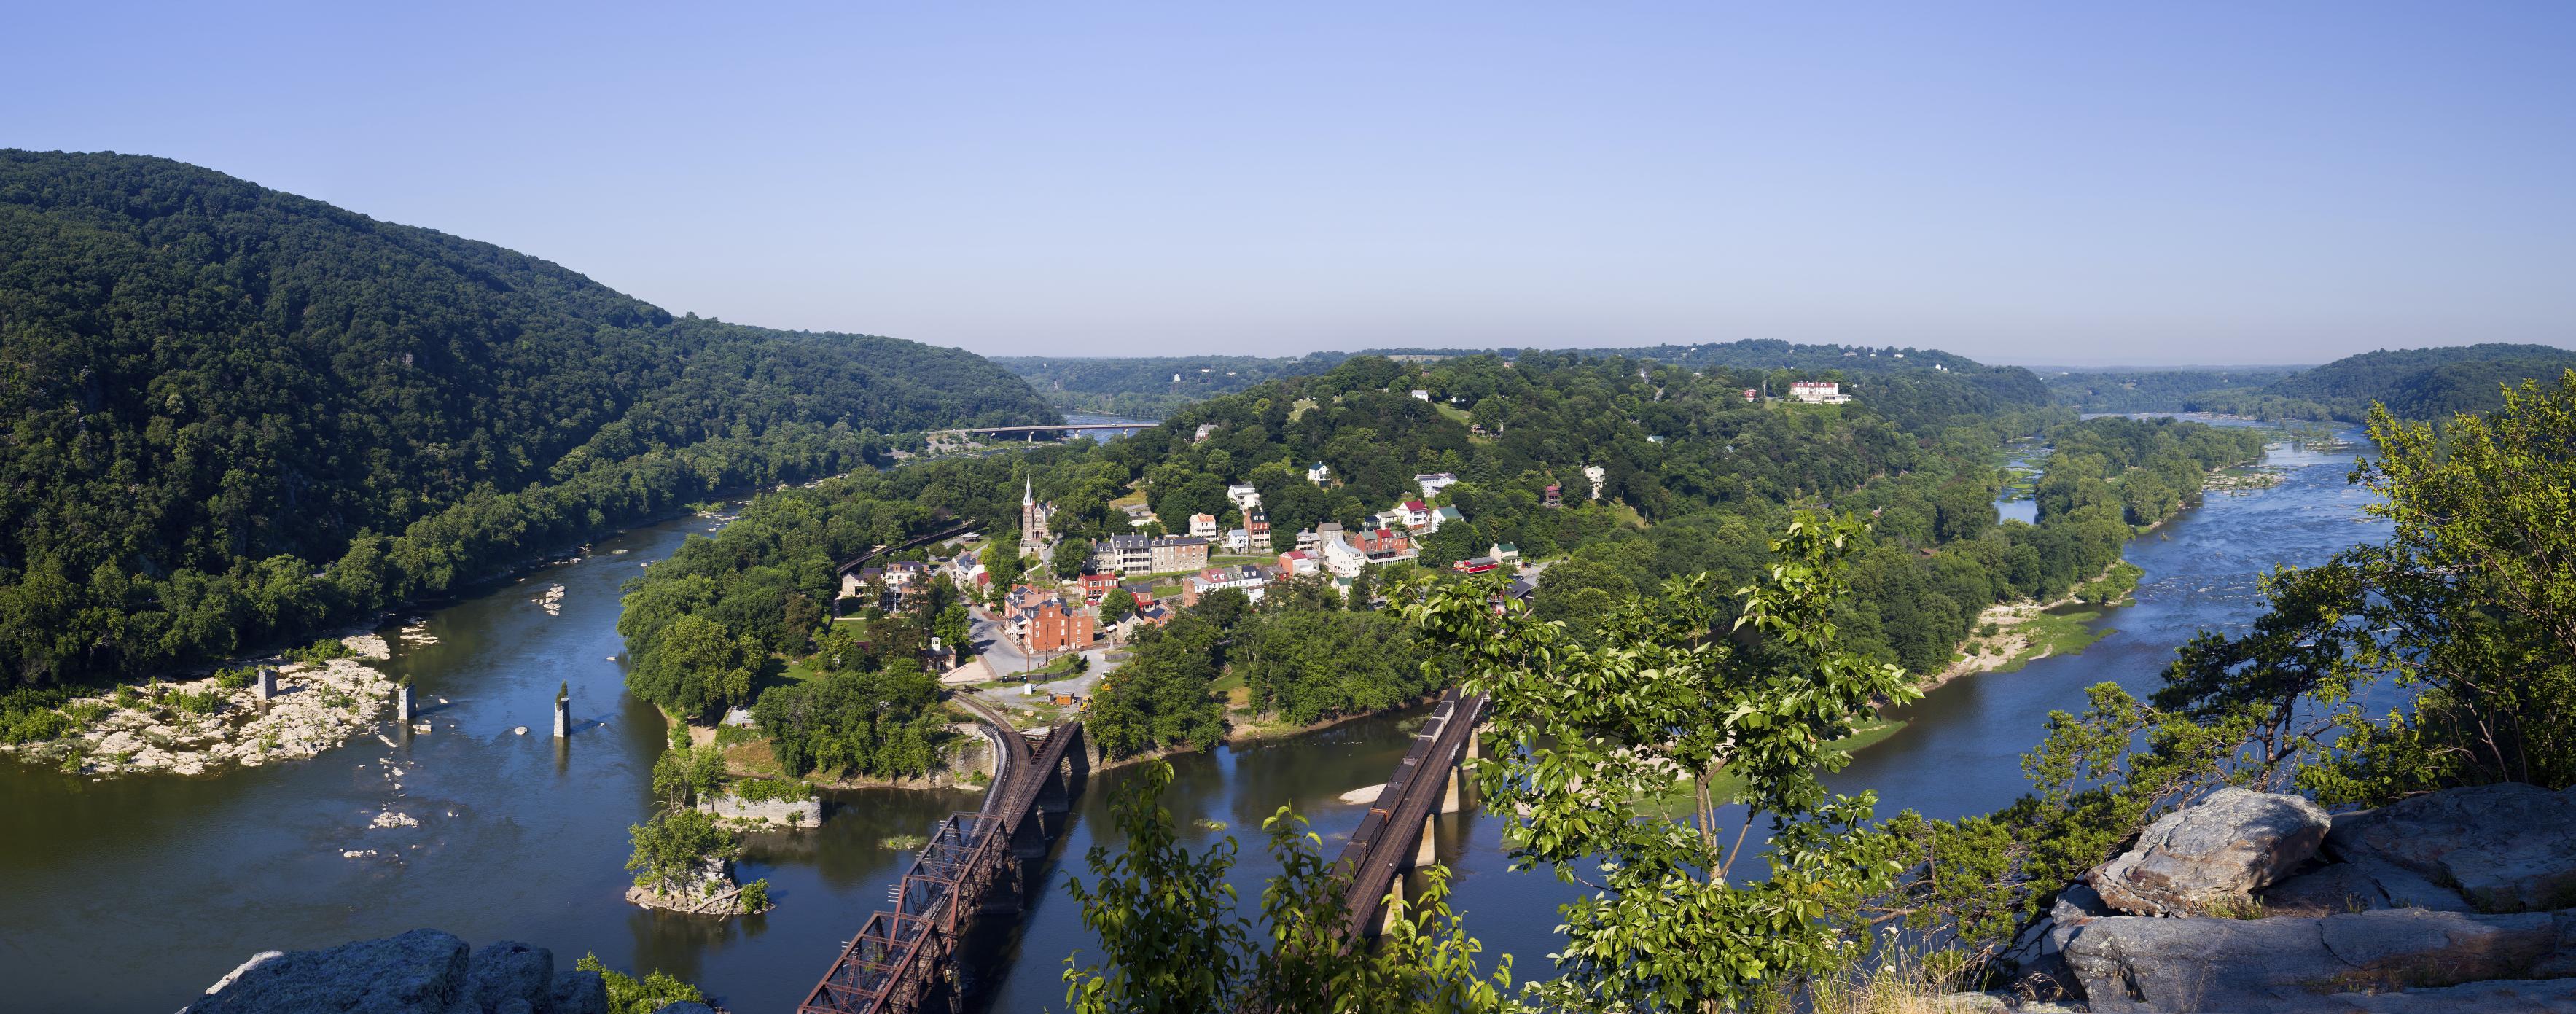 United Ways in West Virginia | United Way Worldwide